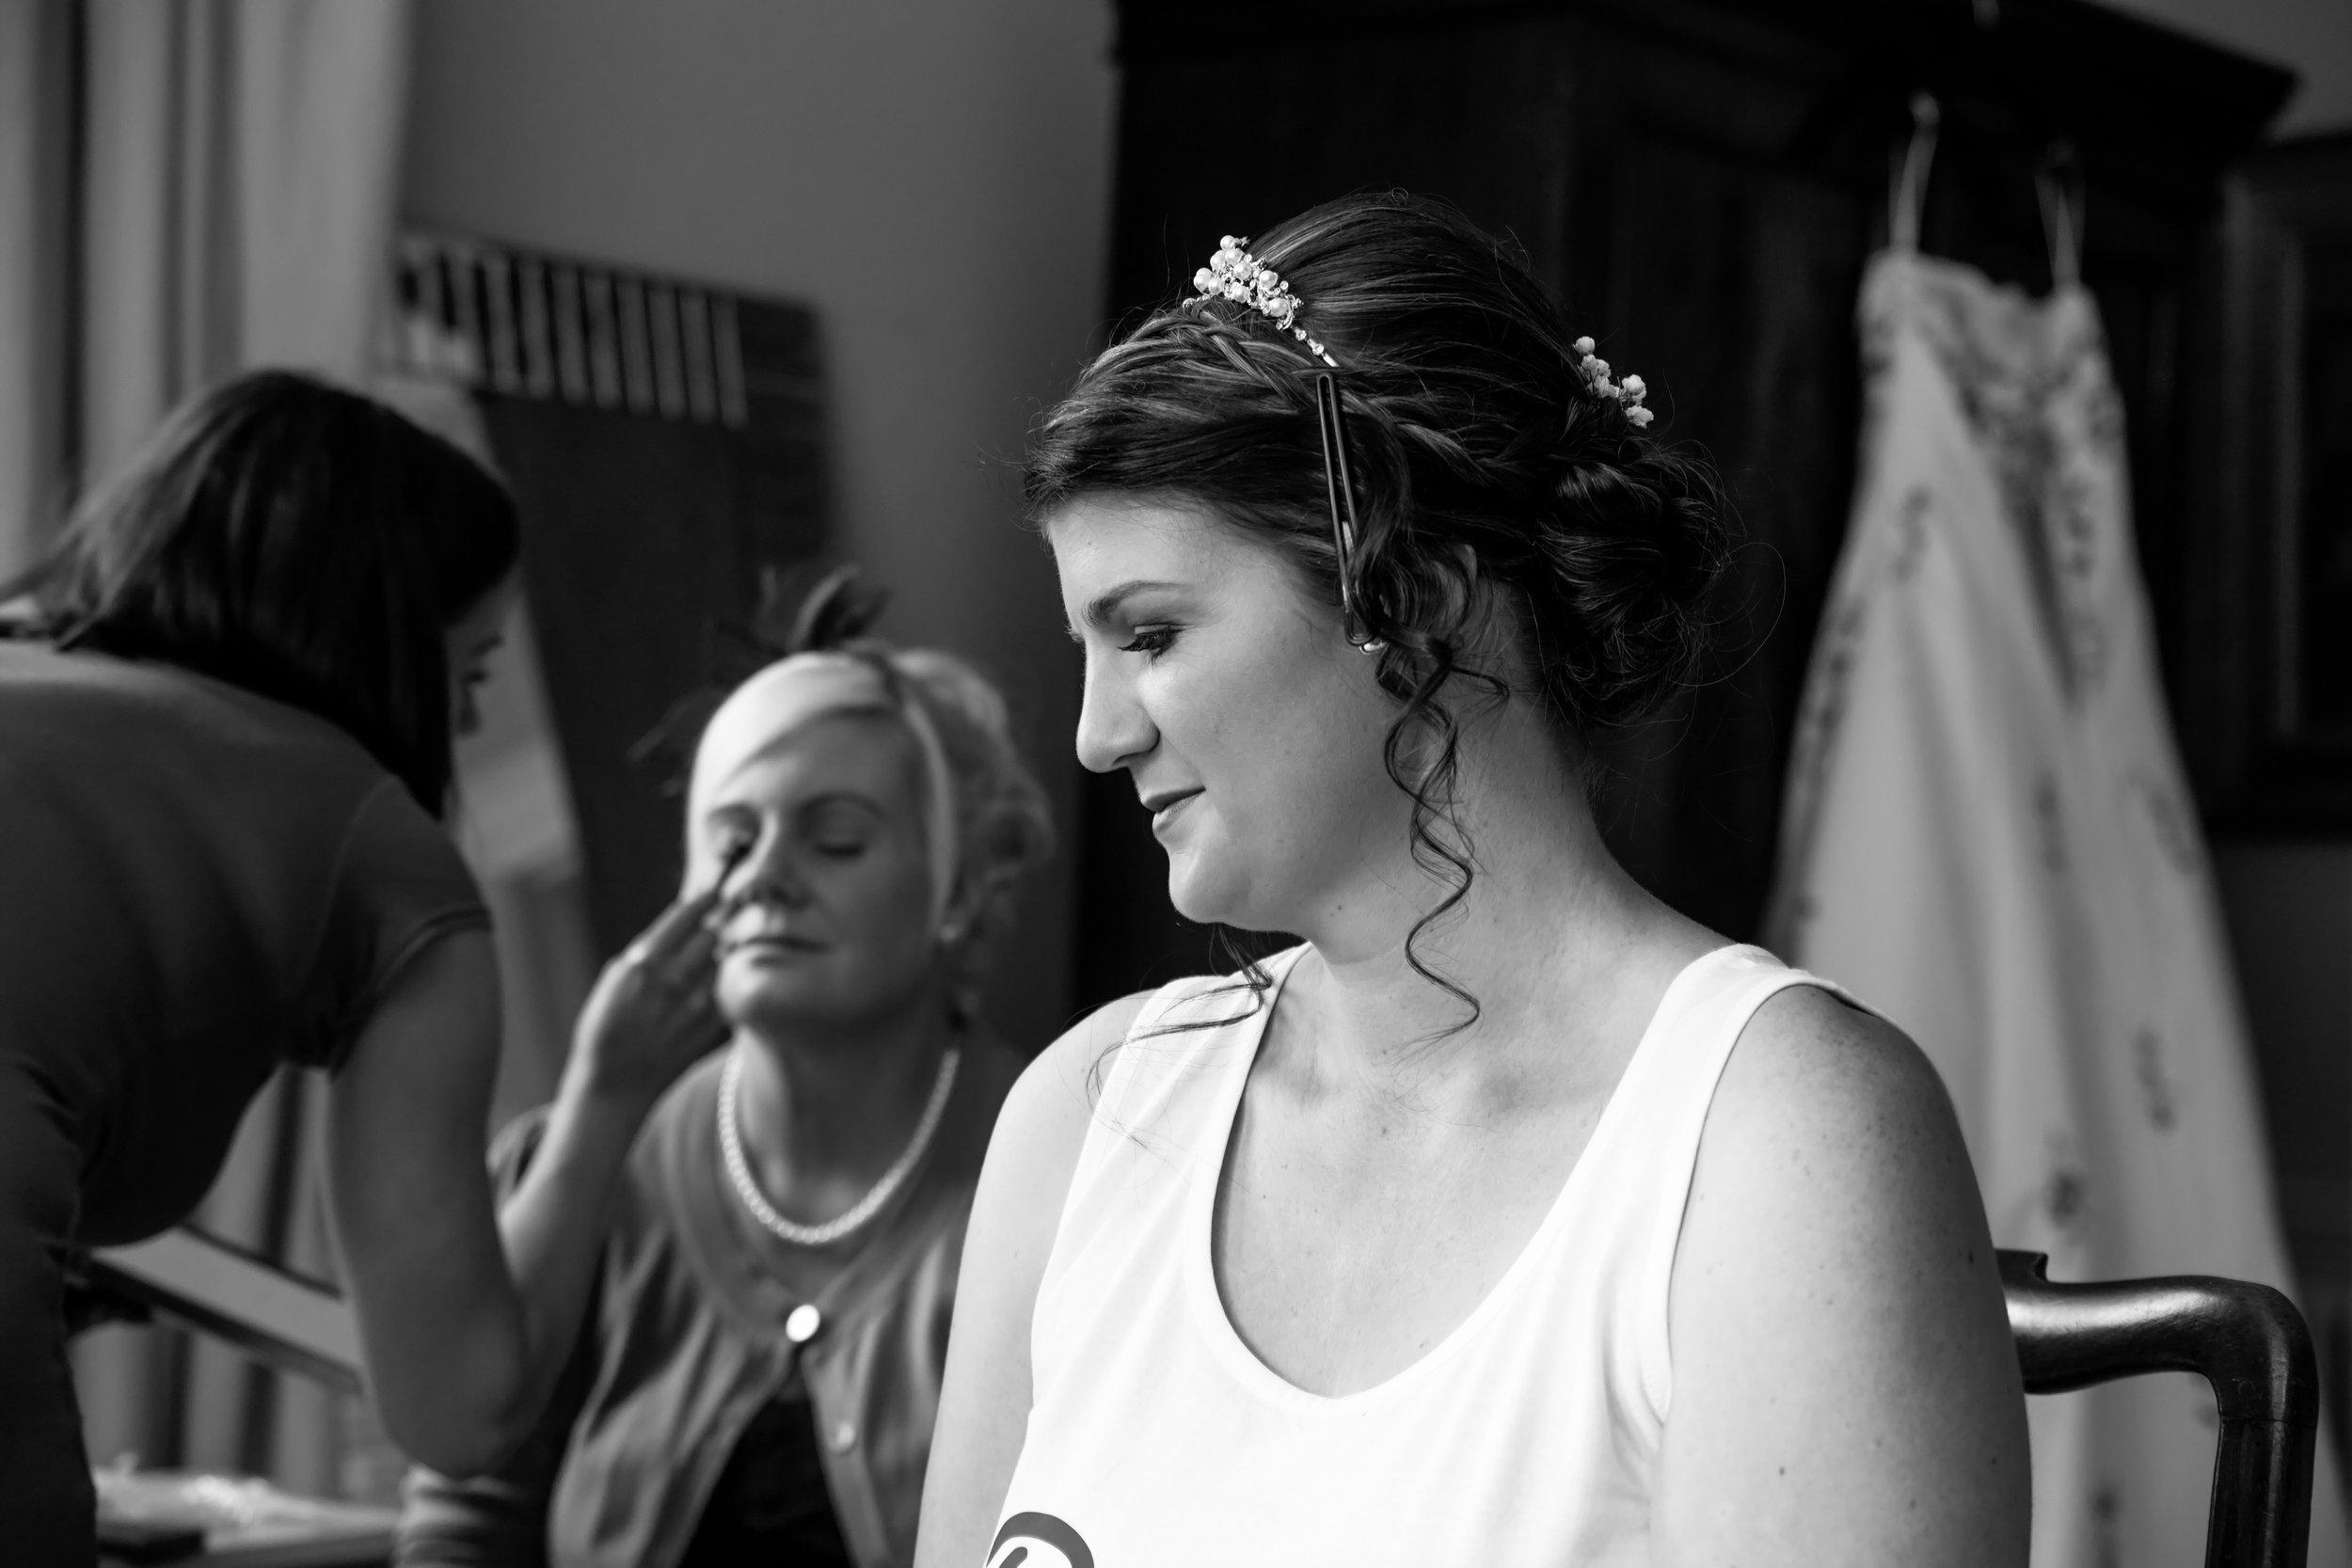 The wedding morning Hair & Make Up before the wedding ceremony at Chippenham Park Estate, Cambridgeshire.